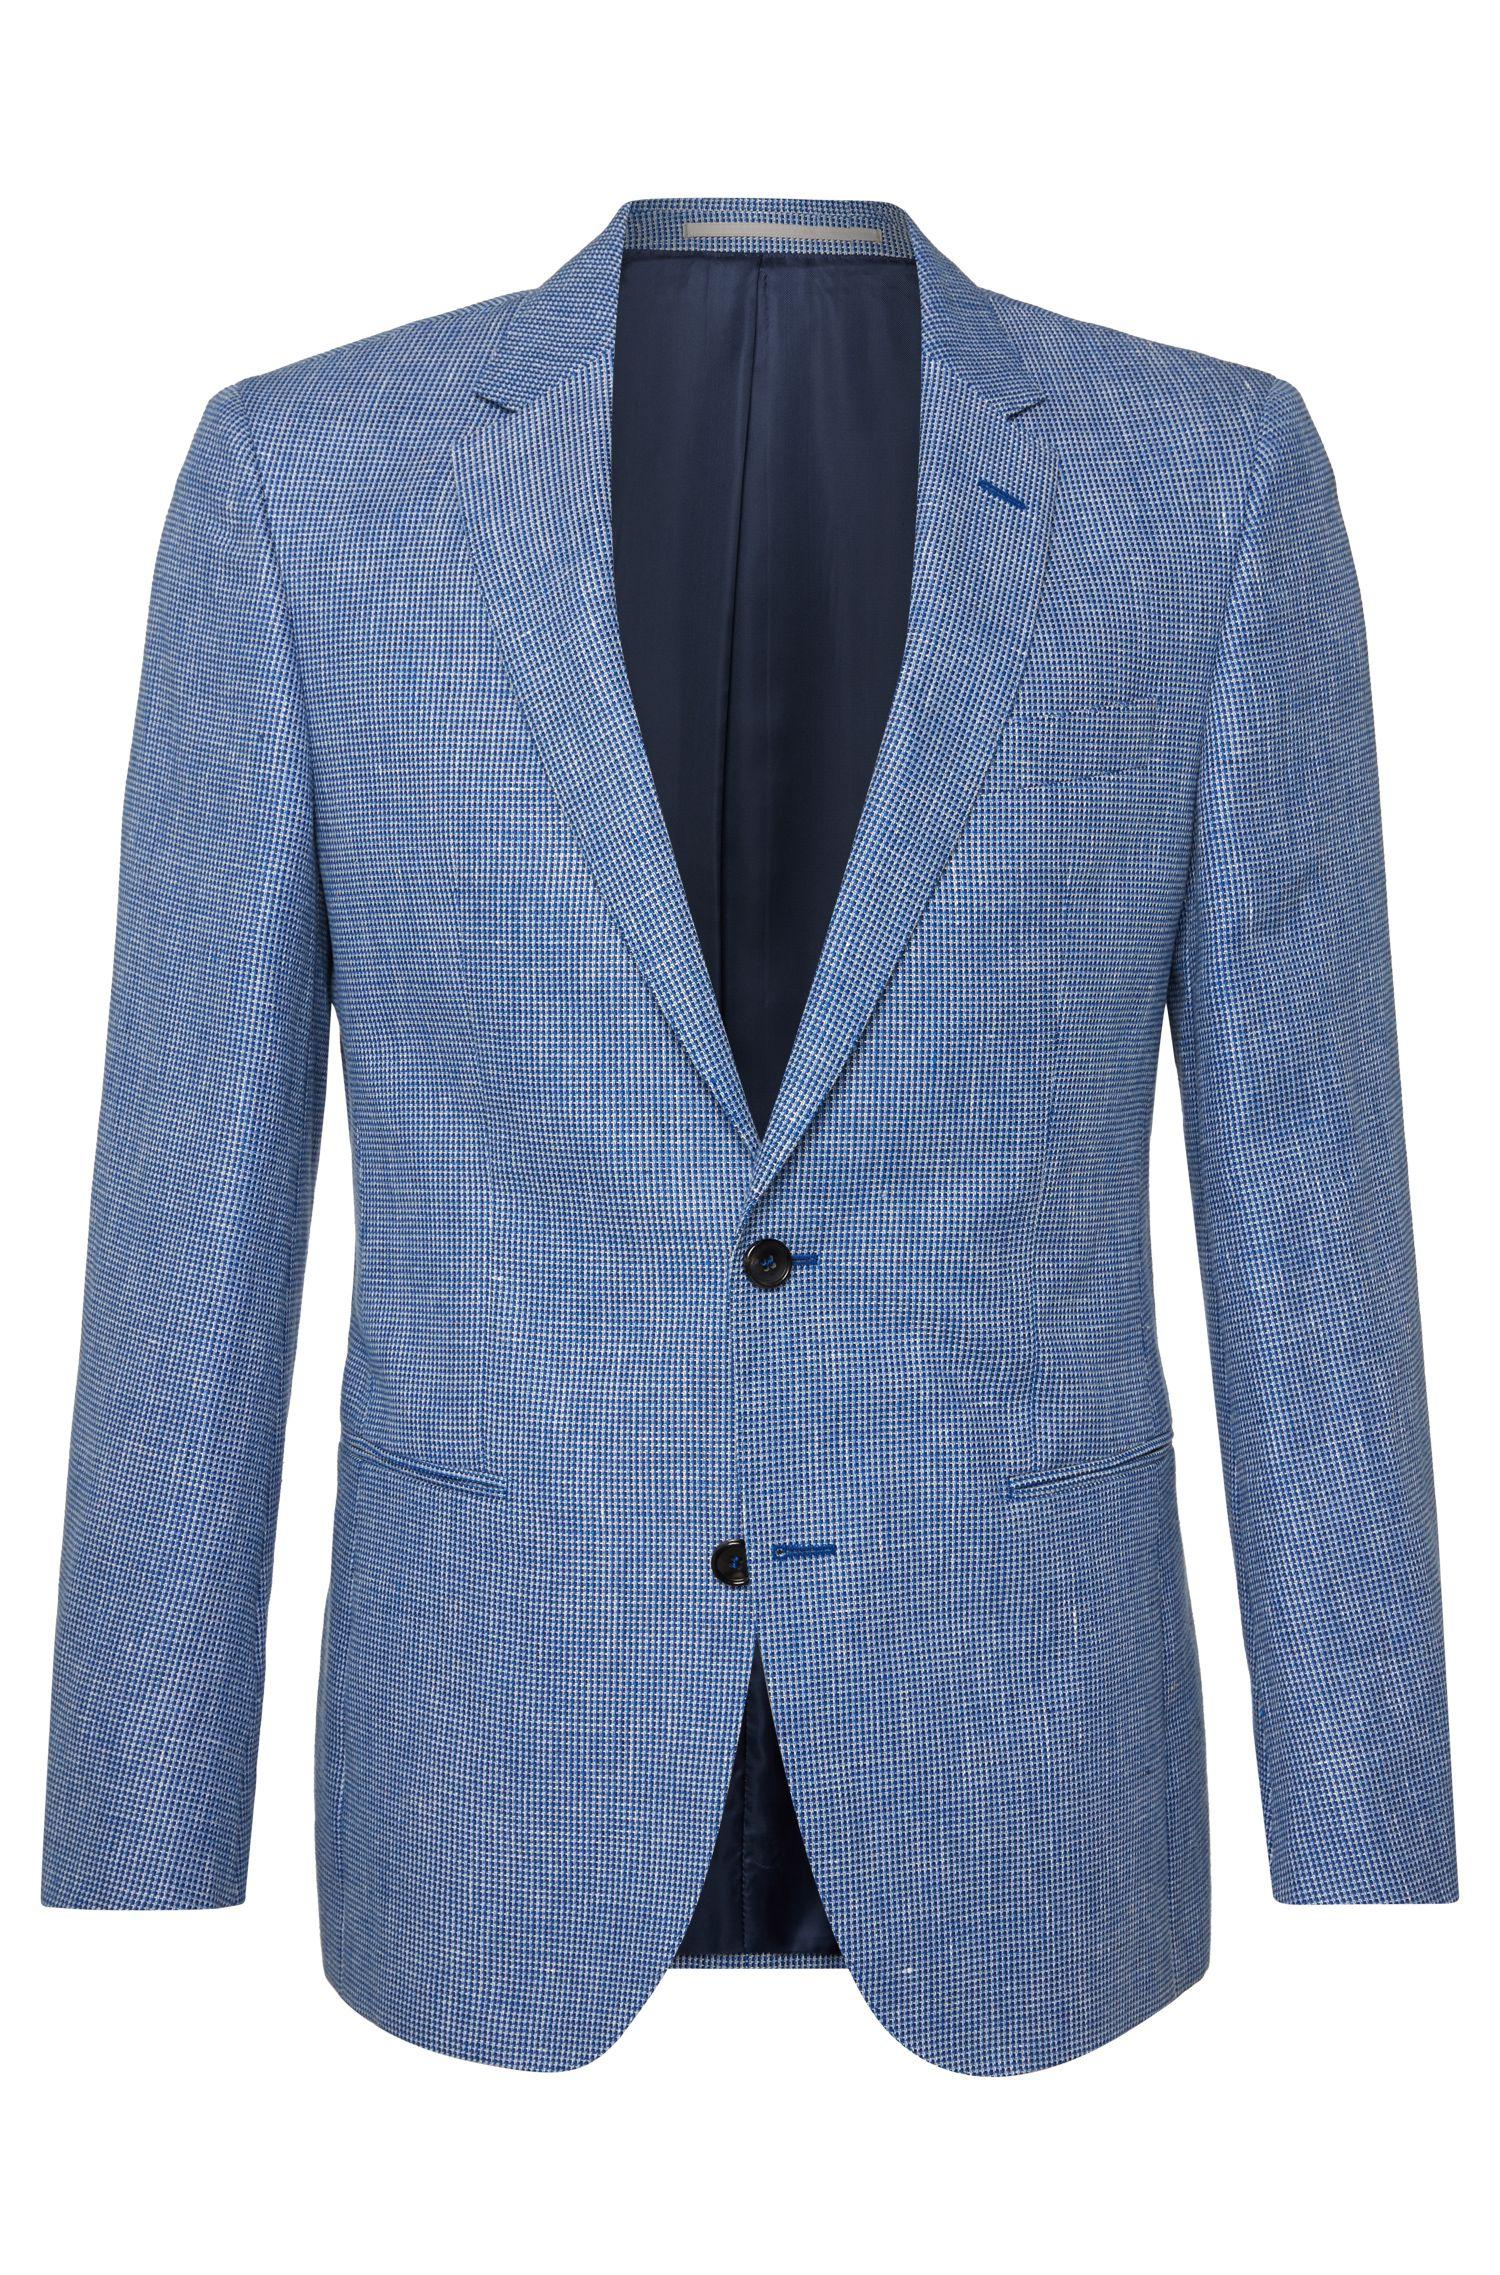 'T-Hale' | Slim Fit, Italian Linen Cotton Sport Coat